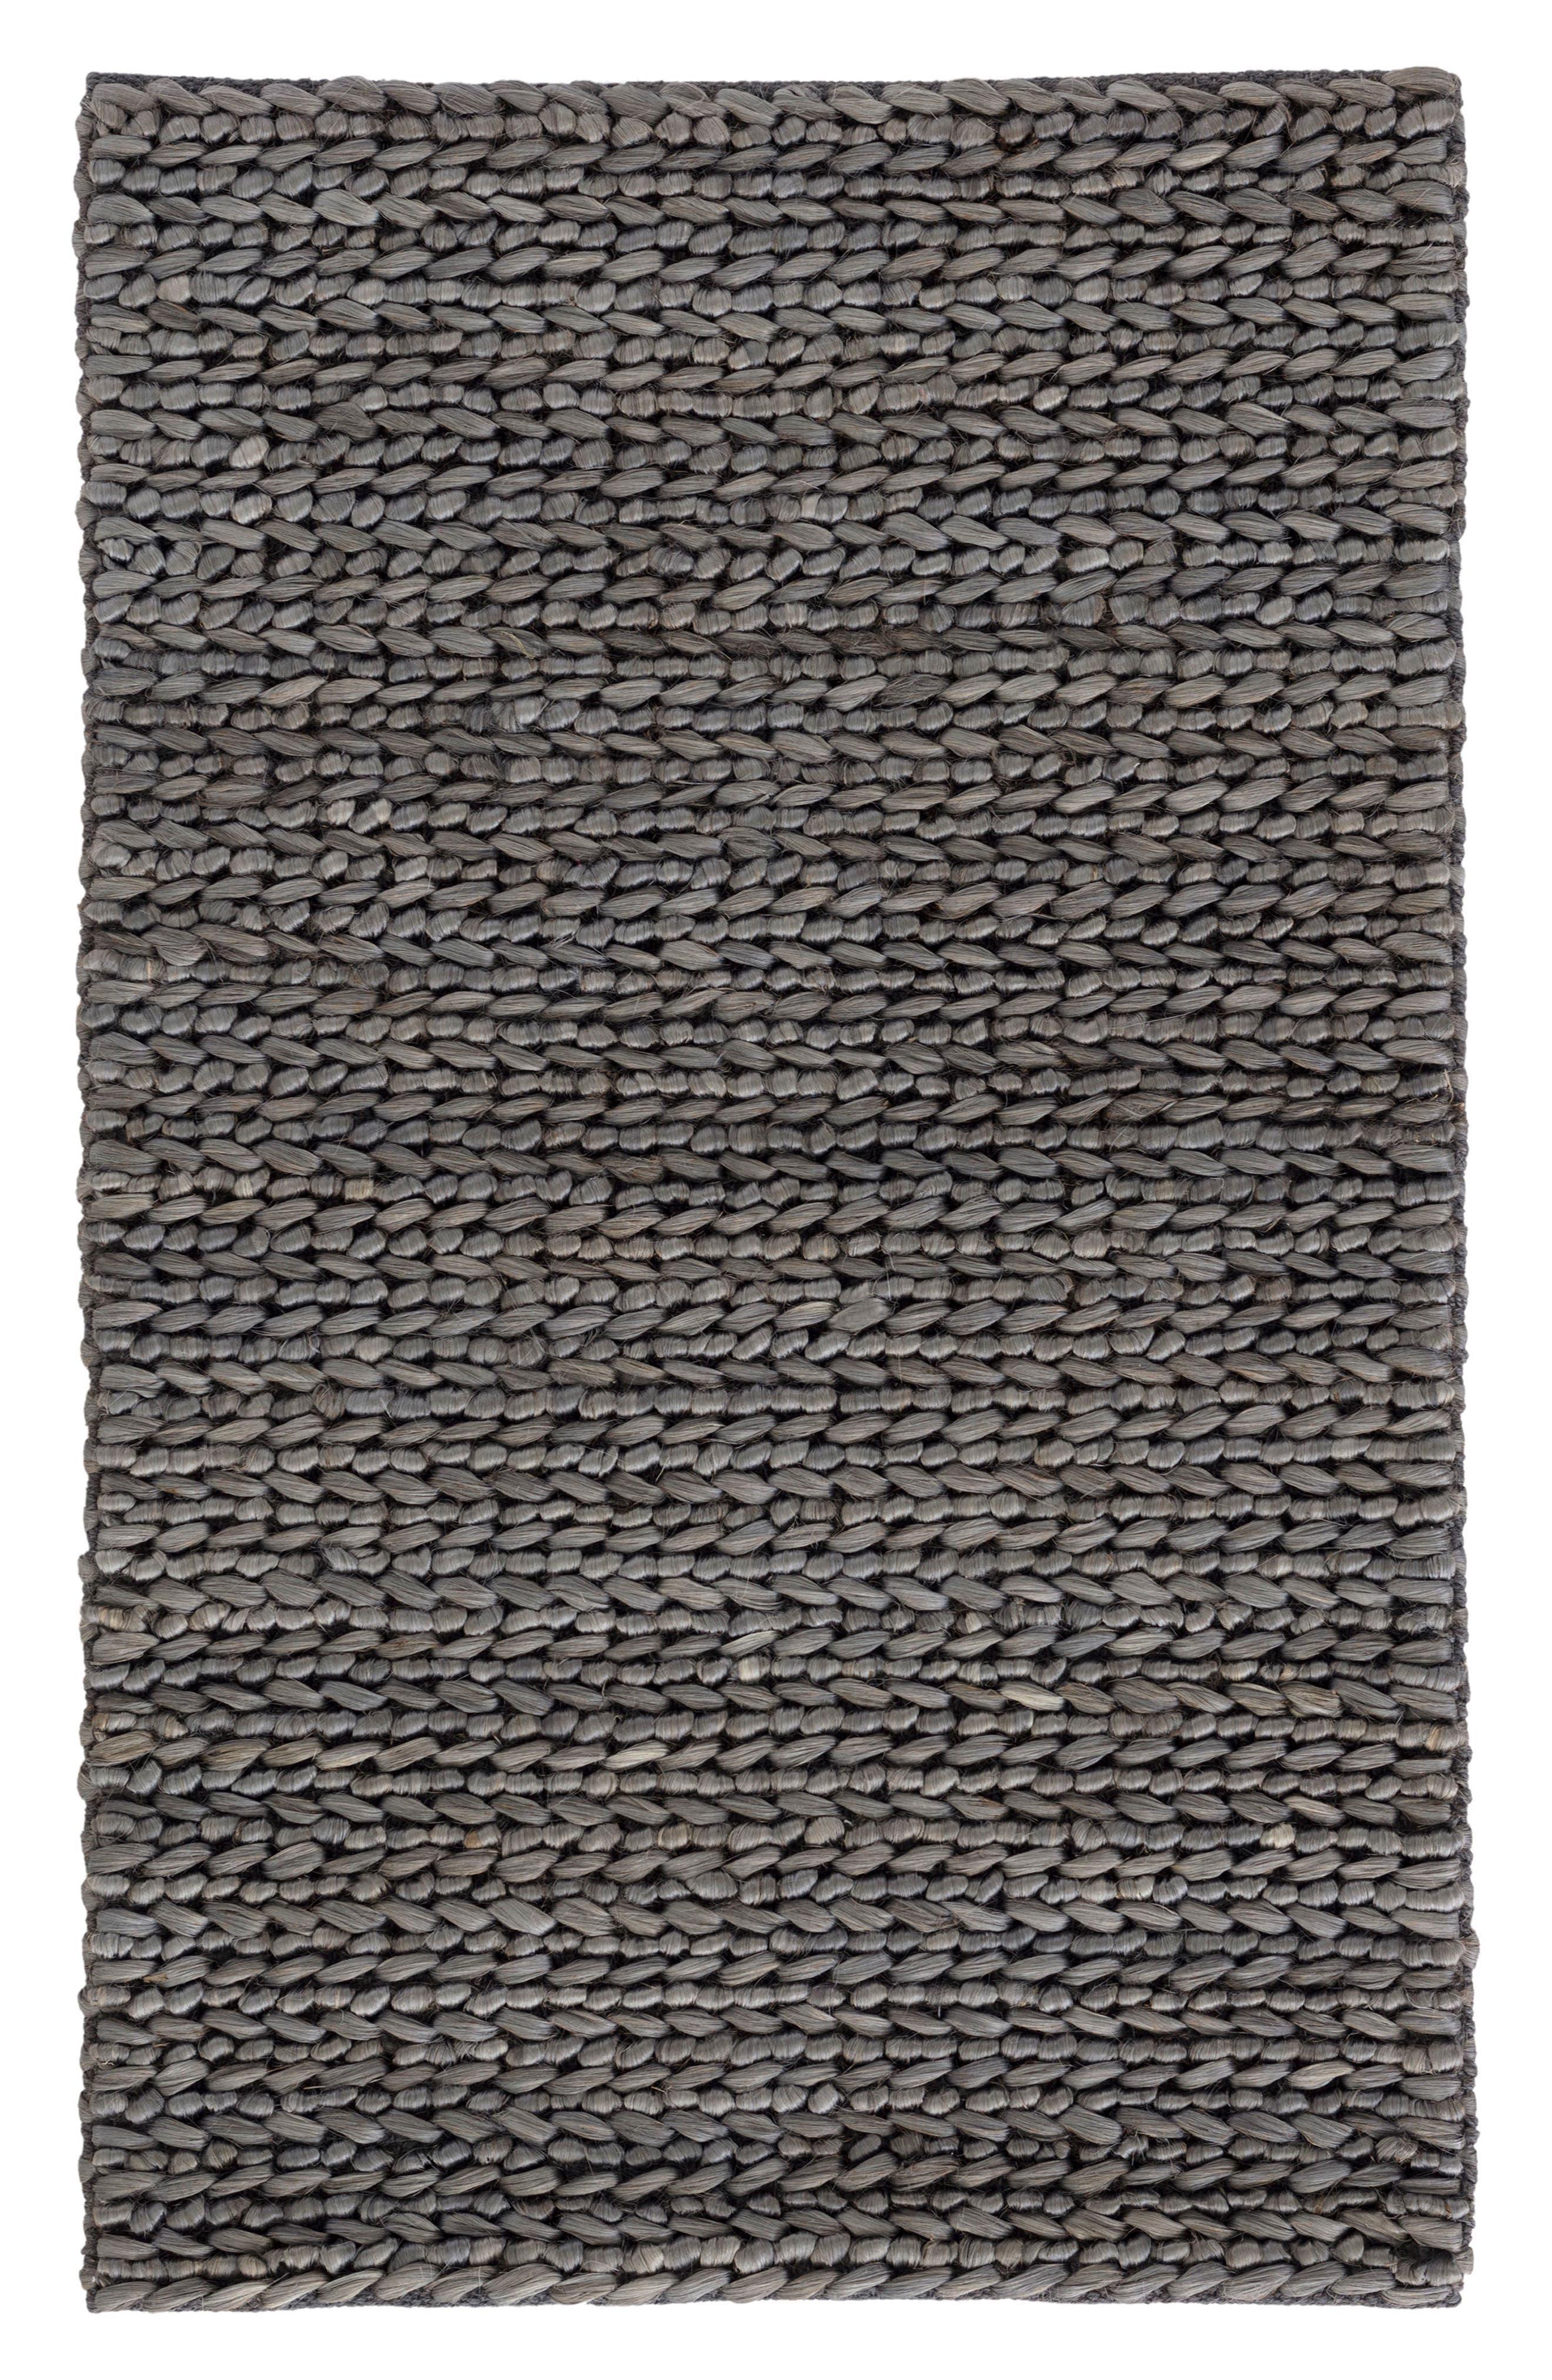 Woven Jute & Cotton Rug,                         Main,                         color, Grey